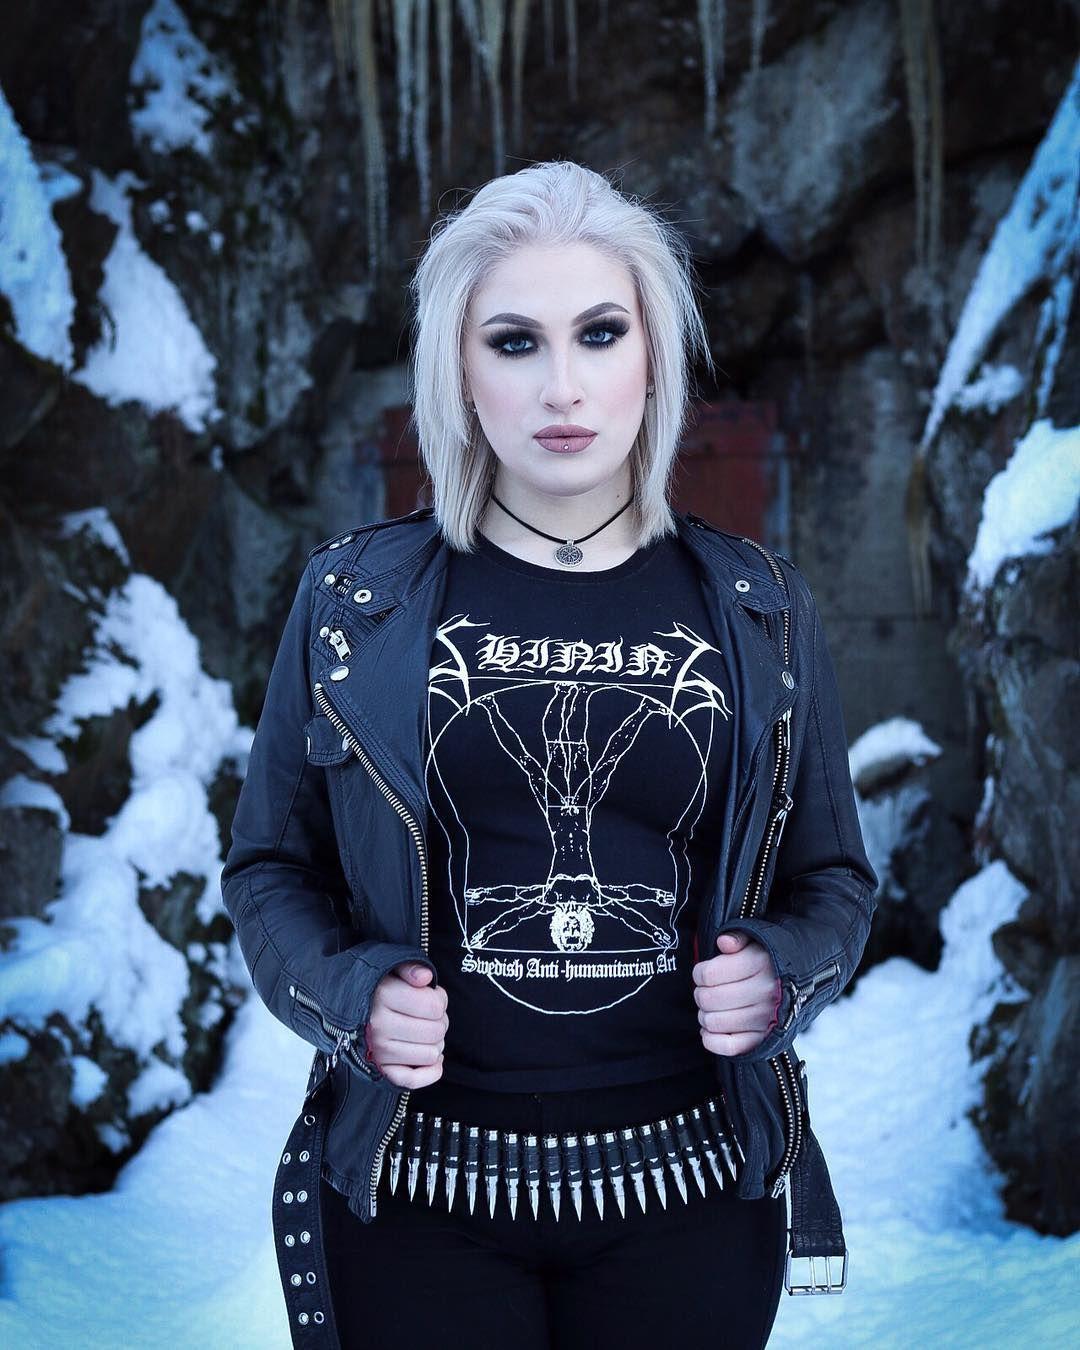 #blackmetalgirl | Metal chicks fashion, Black metal girl